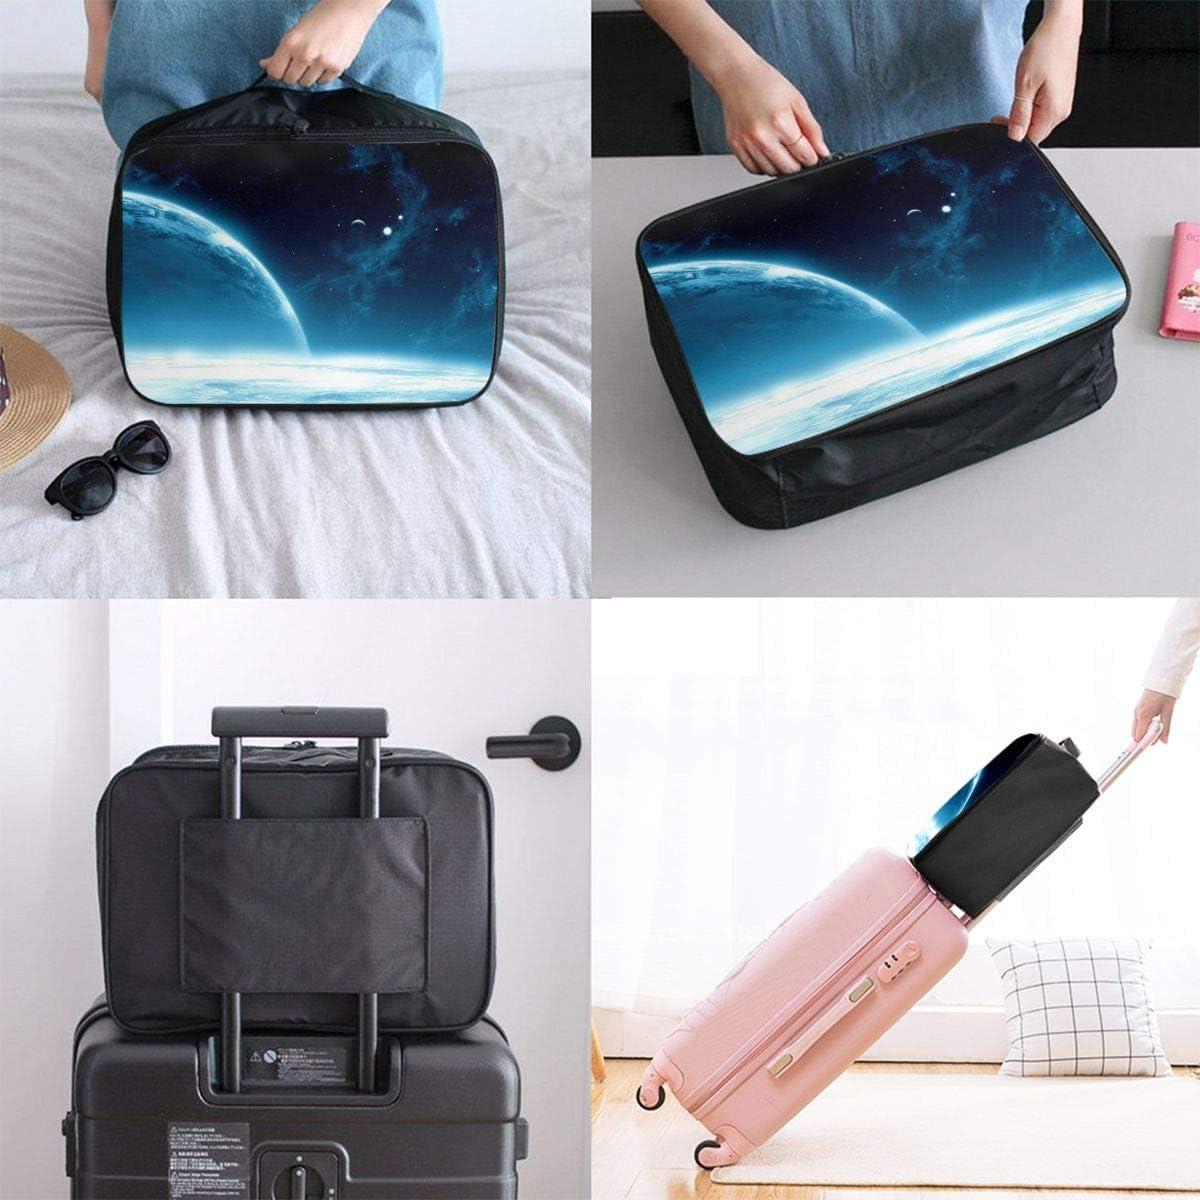 Yunshm Space Planet Light Galaxy Customized Trolley Handbag Waterproof Unisex Large Capacity For Business Travel Storage